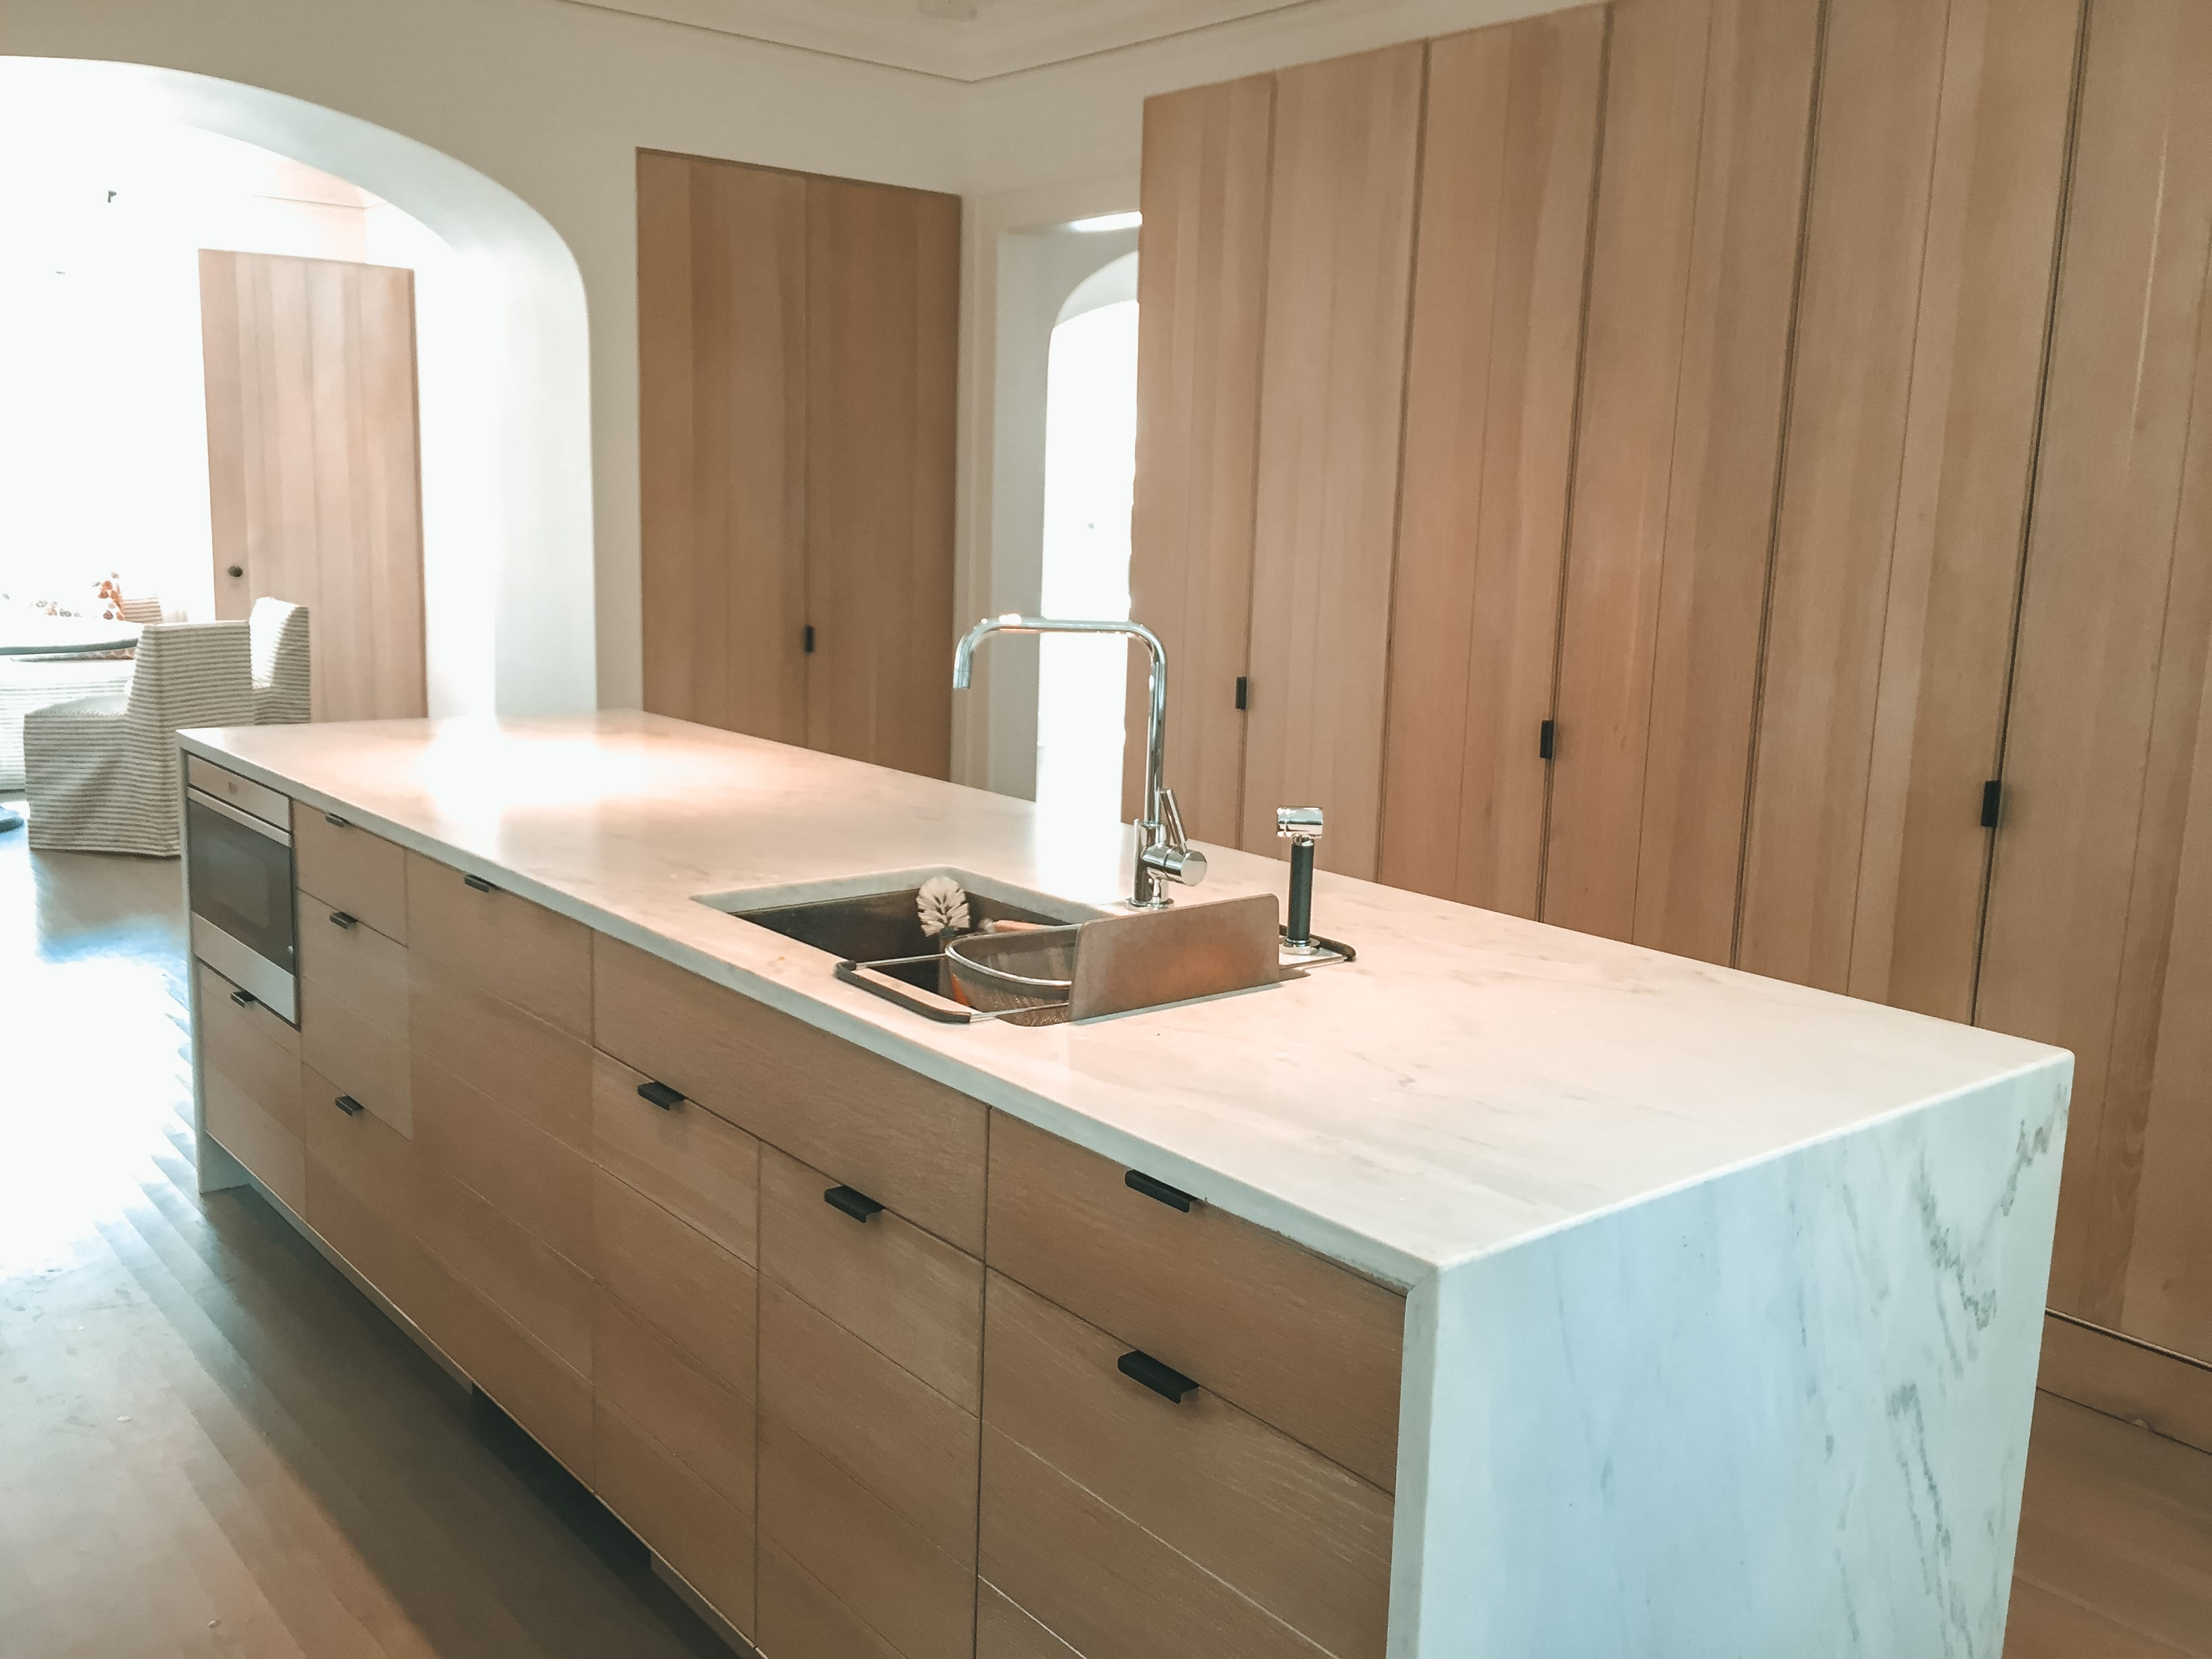 Simple White Oak Kitchen Storage Cabinetry